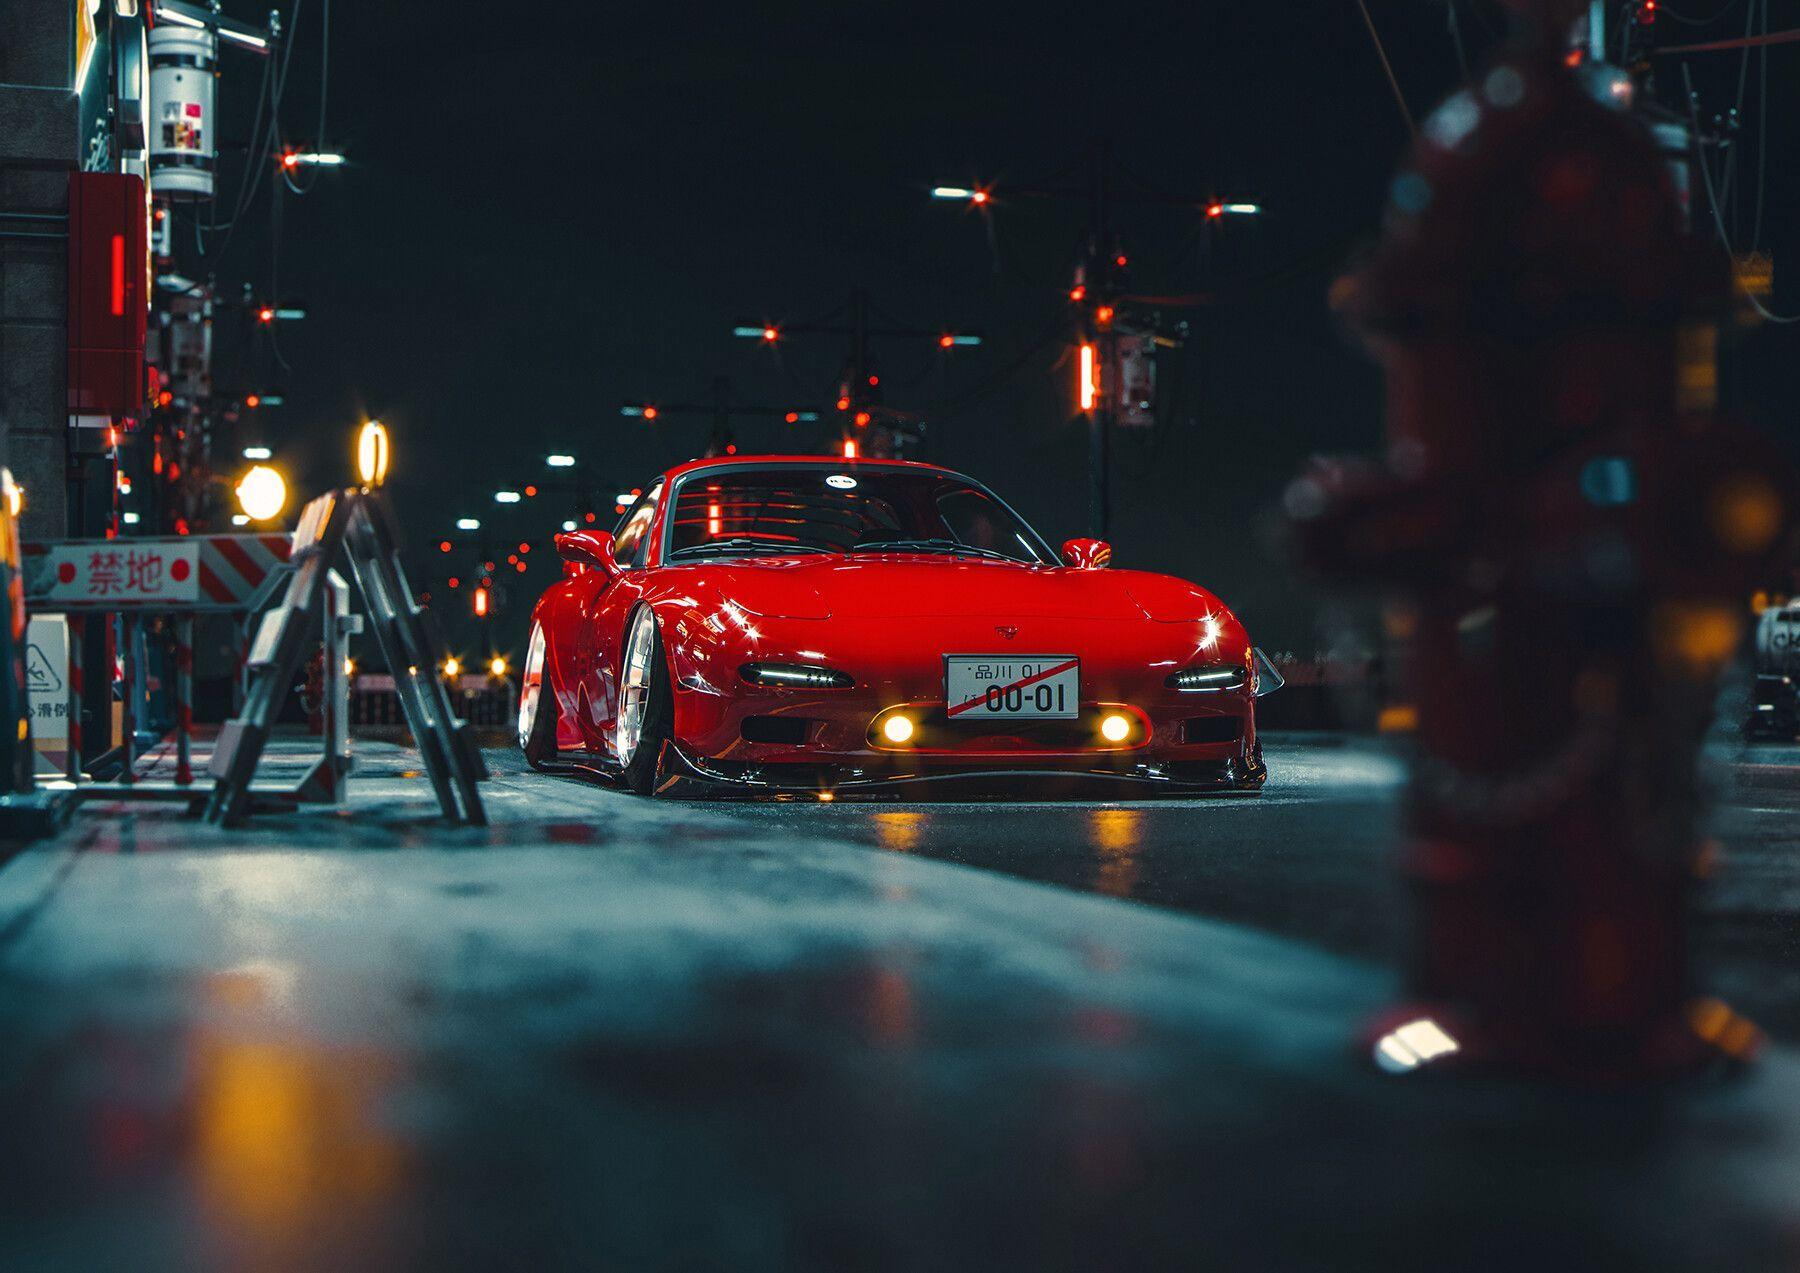 Lamborghini terzo millennio 2020 4k. Red Jdm Wallpapers Wallpaper Cave